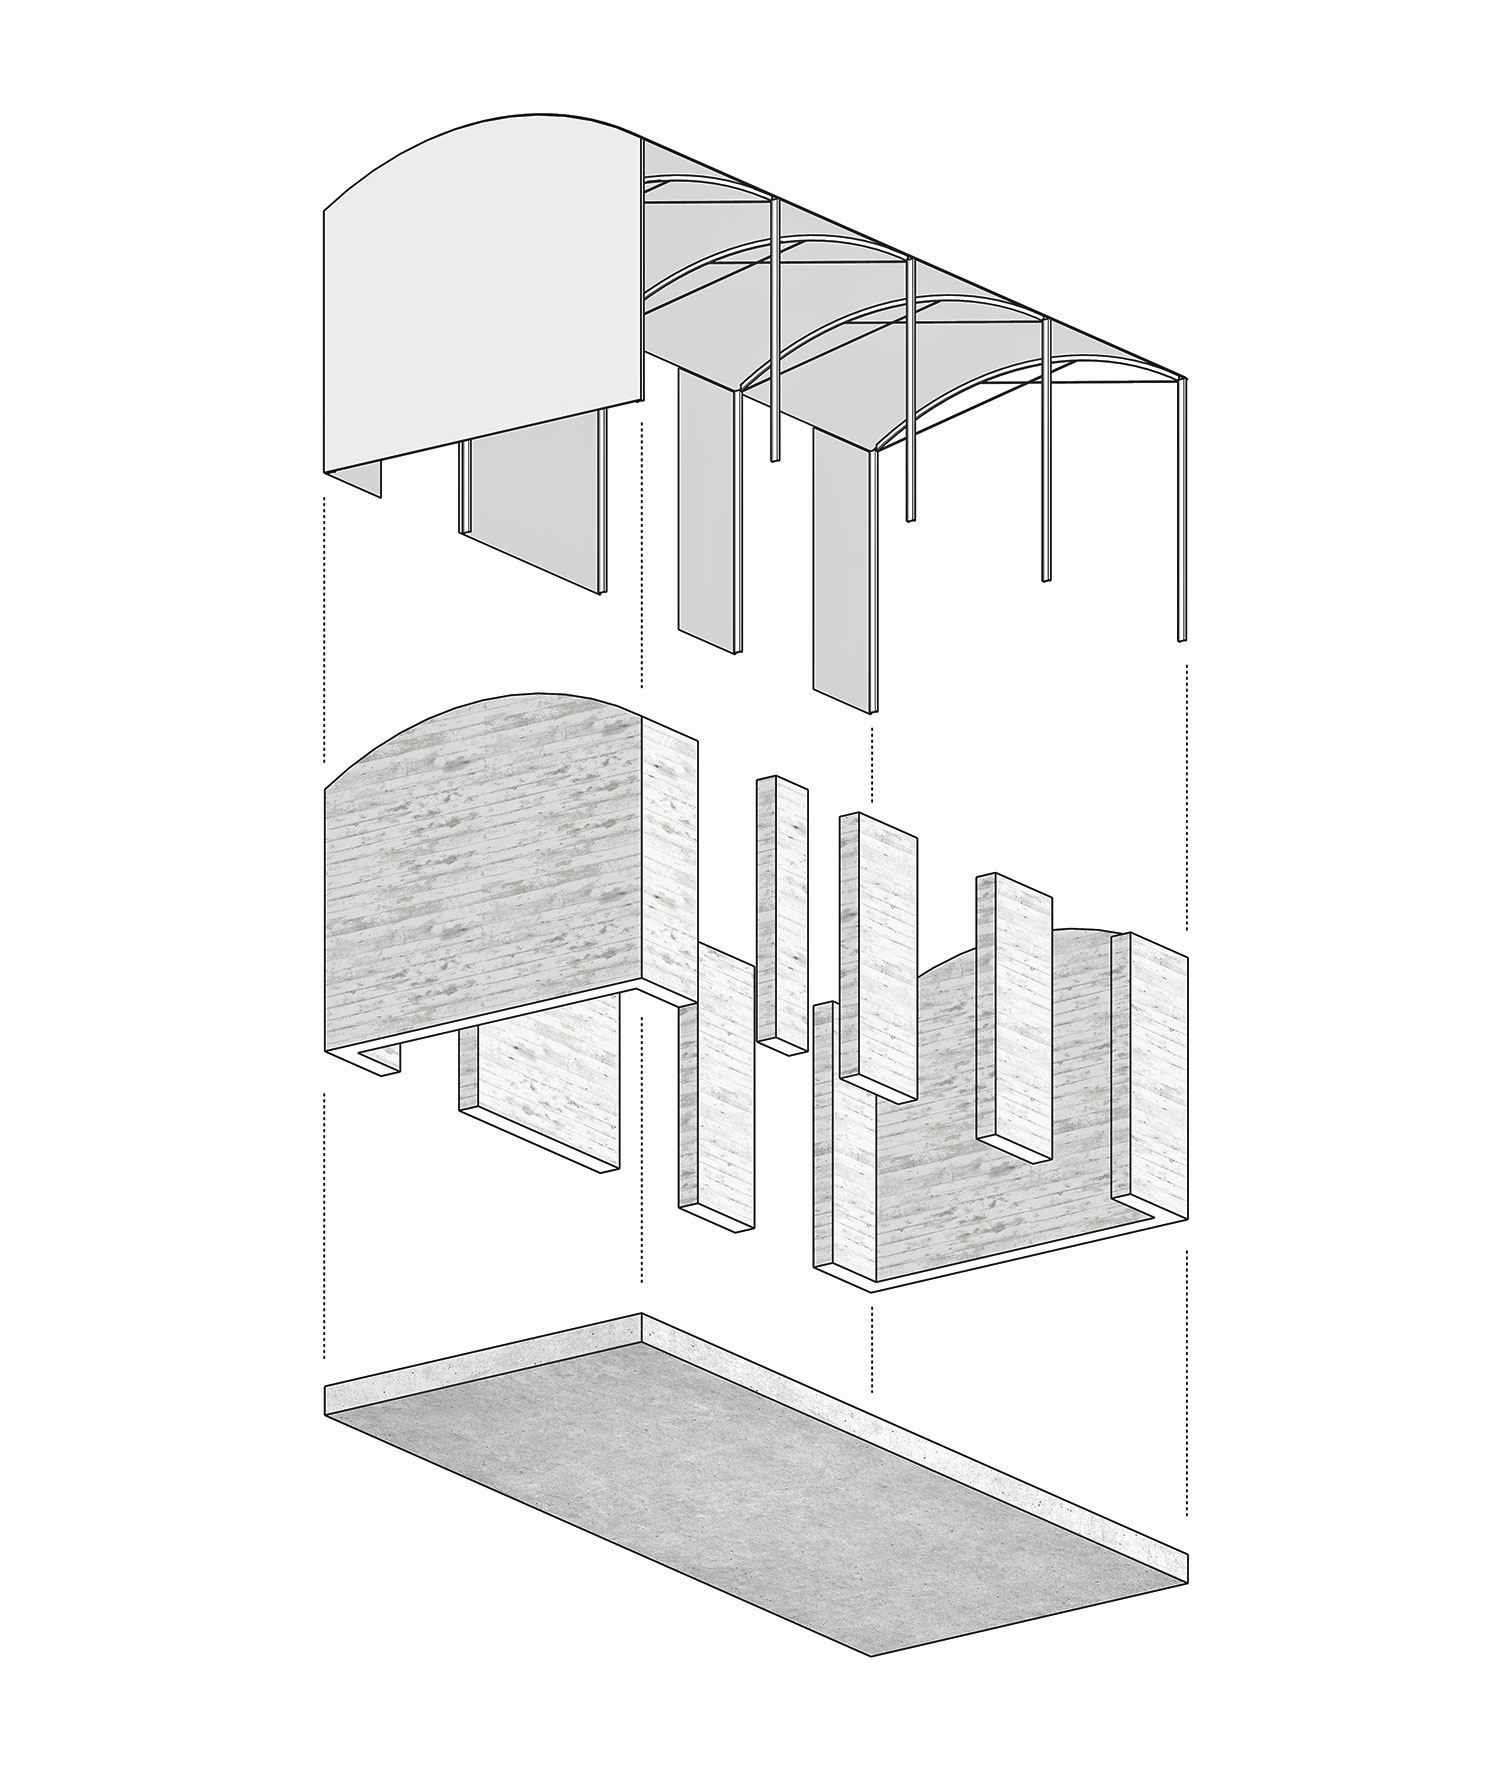 Dutch-Barn-Conversion-Somerset-Axonometric-Diagram.jpg